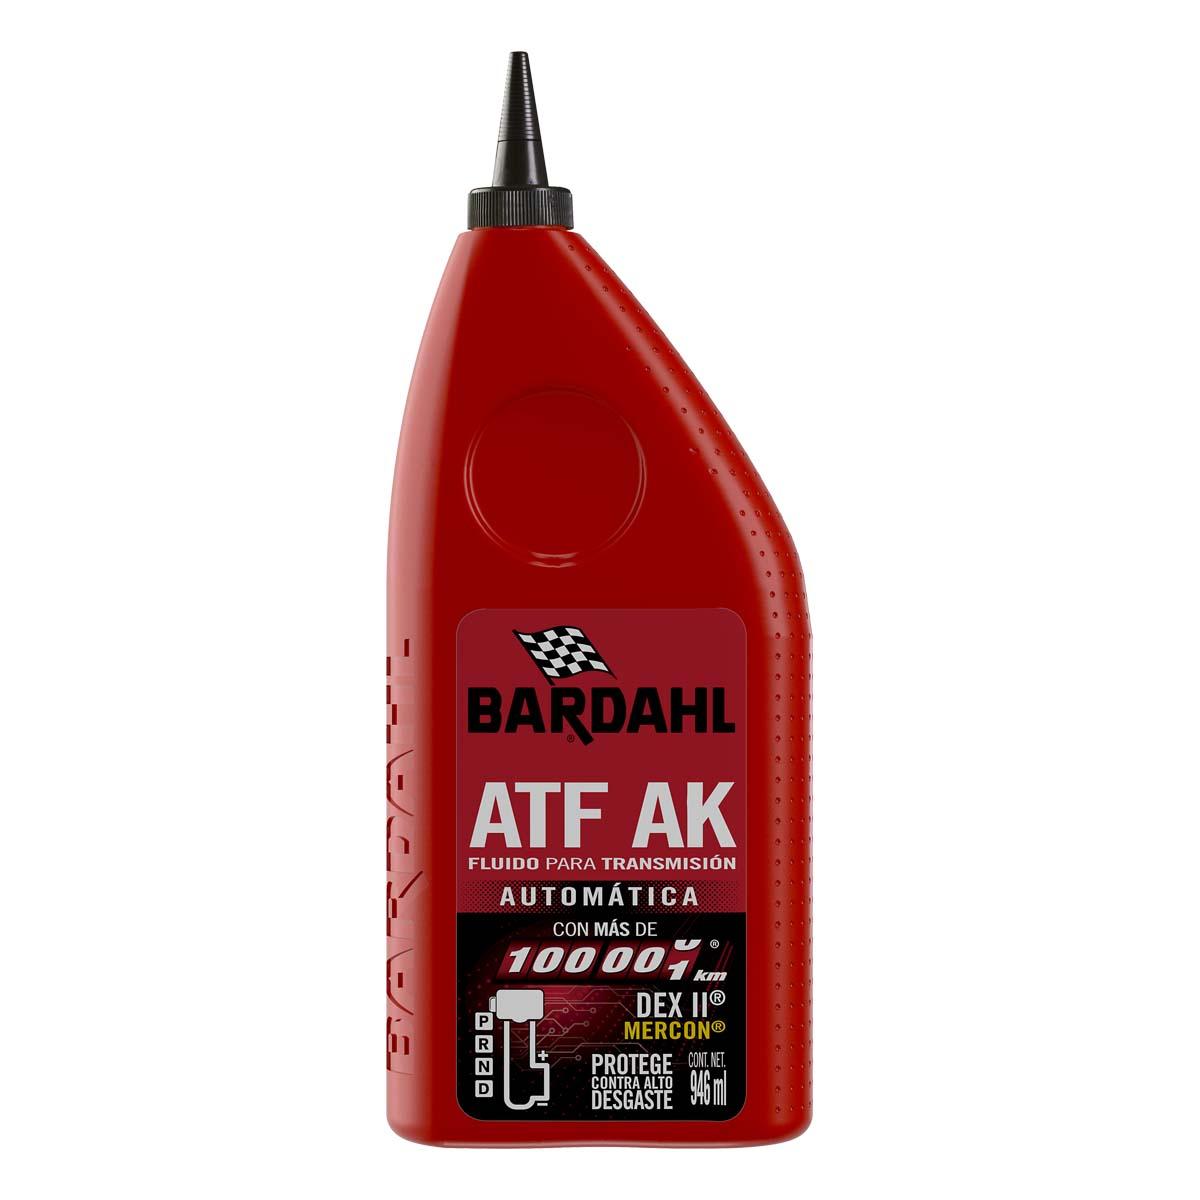 Aceite Lubricante + 100000 Kms Caja Automatica 946ml Bardahl